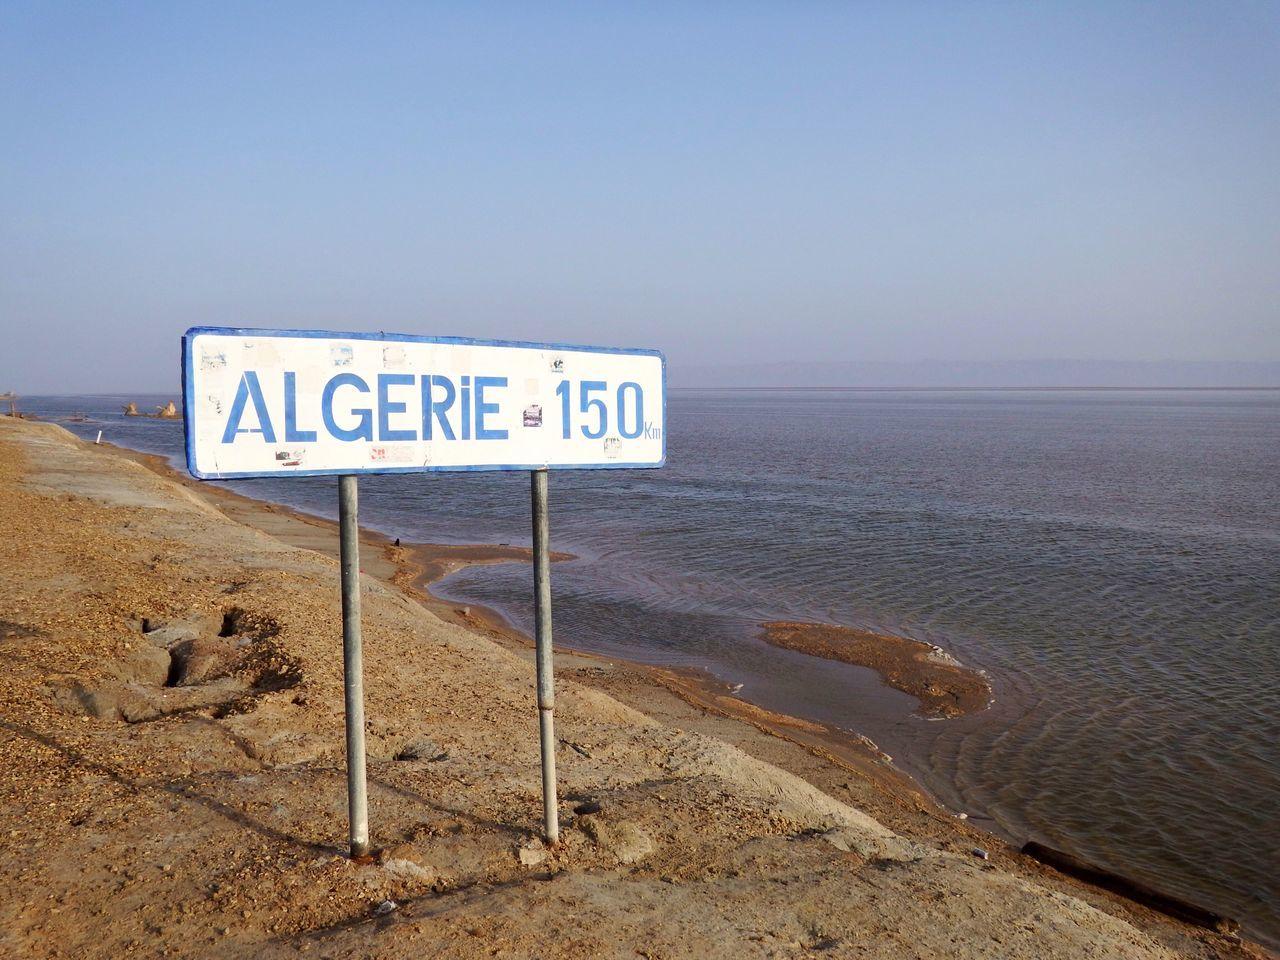 Lake Lakeshore Desert Streetsign Chott El Djerid Tunesia No People Traveling Day Sunshine Sign Blue Sky Wather